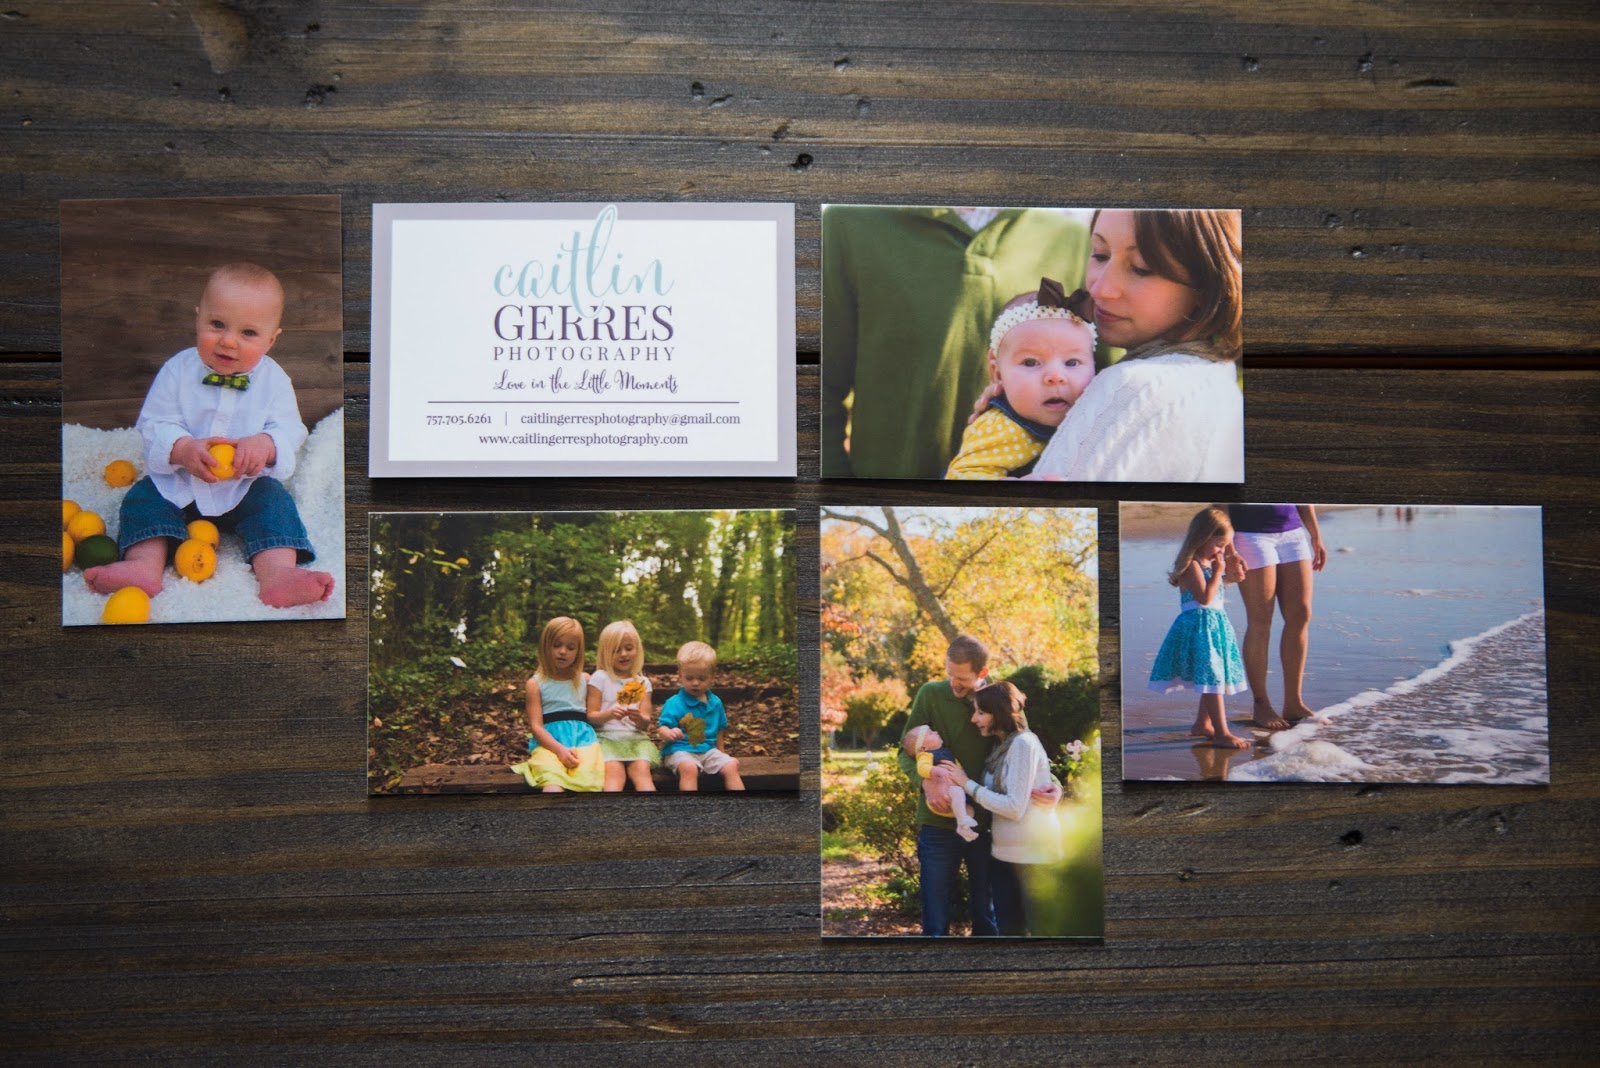 Caitlin+Gerres+Photography+Business+Cards-113.jpg